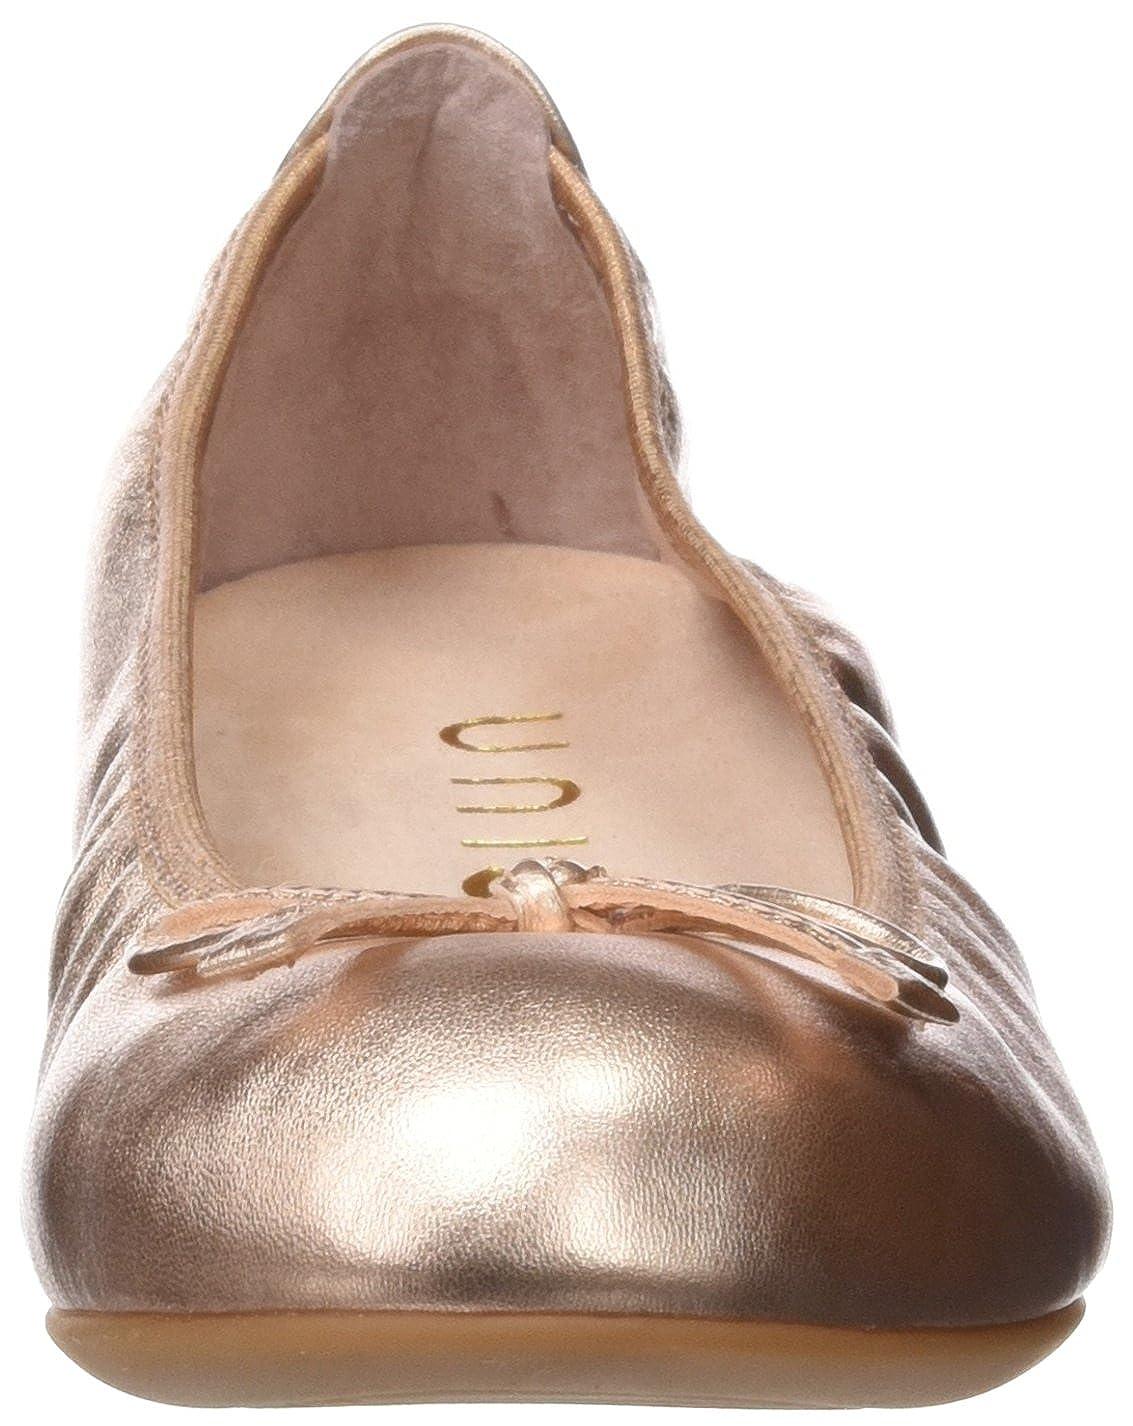 Unisa Damen Acor_17_LMT Geschlossene Geschlossene Acor_17_LMT Ballerinas Gold (Ballet) f7ee9f